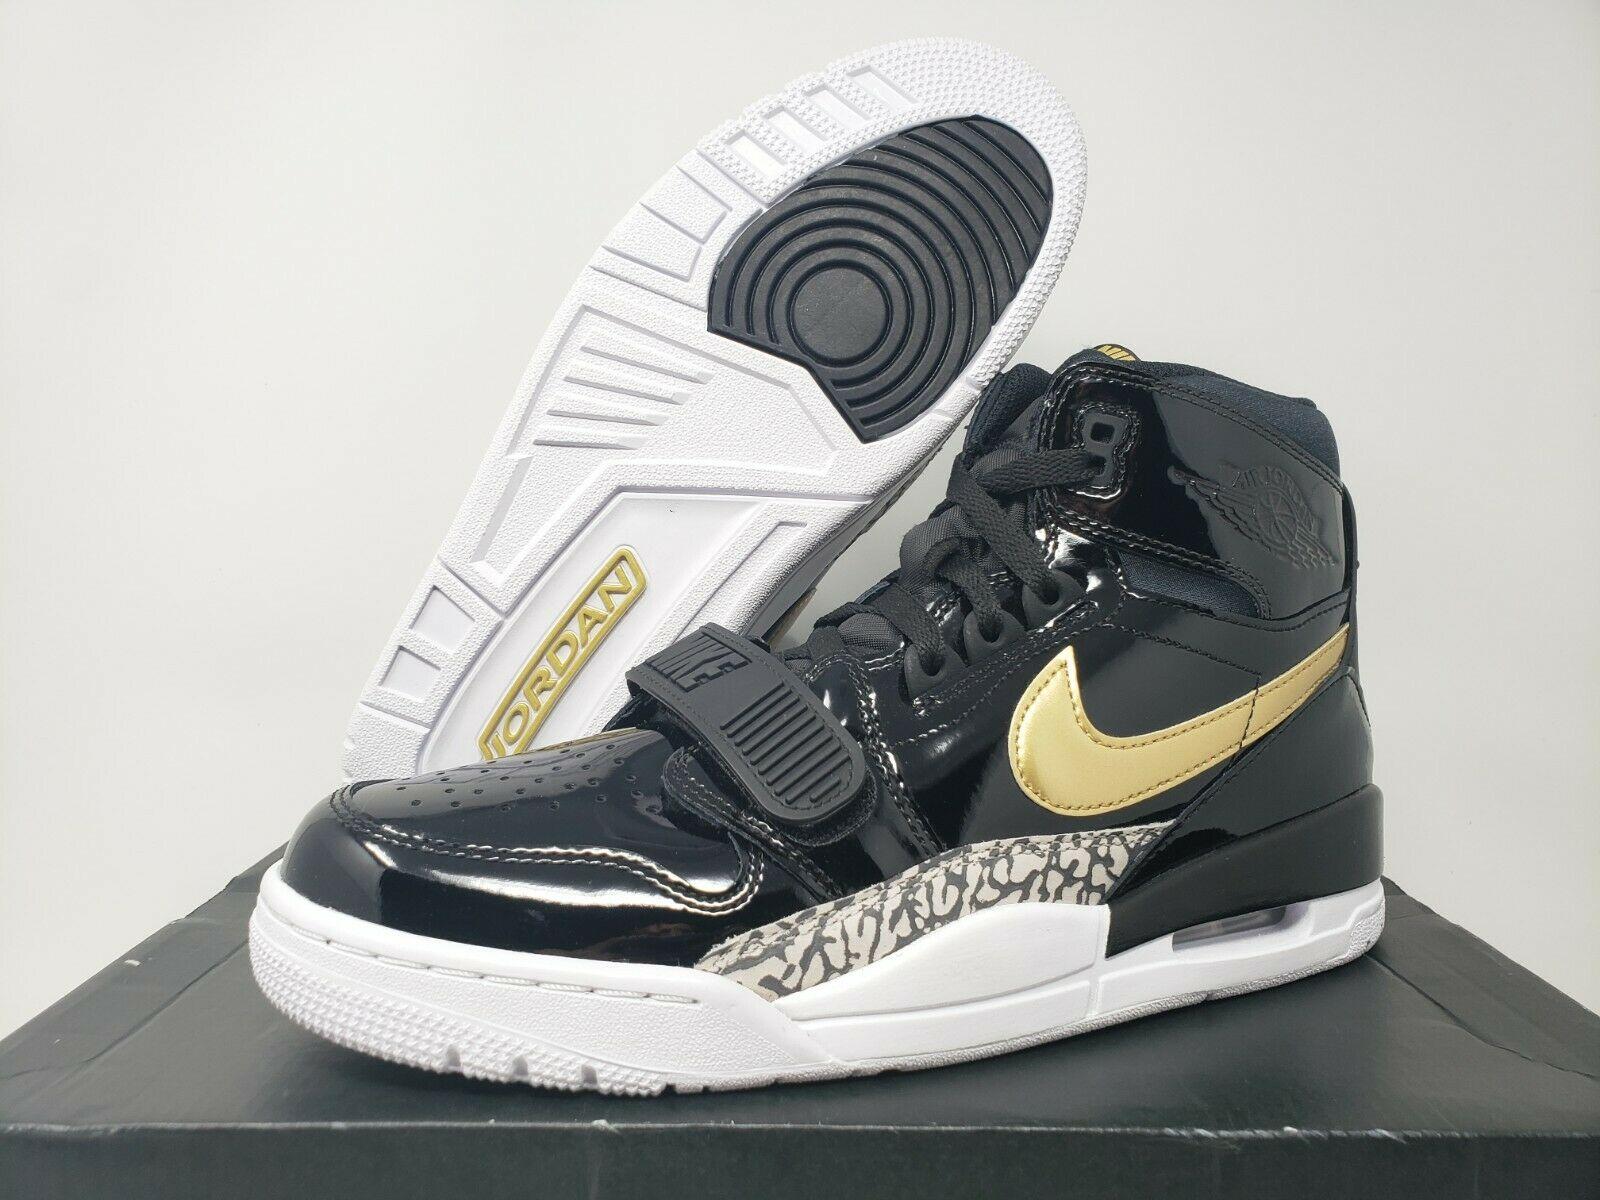 Jordan Legacy 312 Black Gold Patent